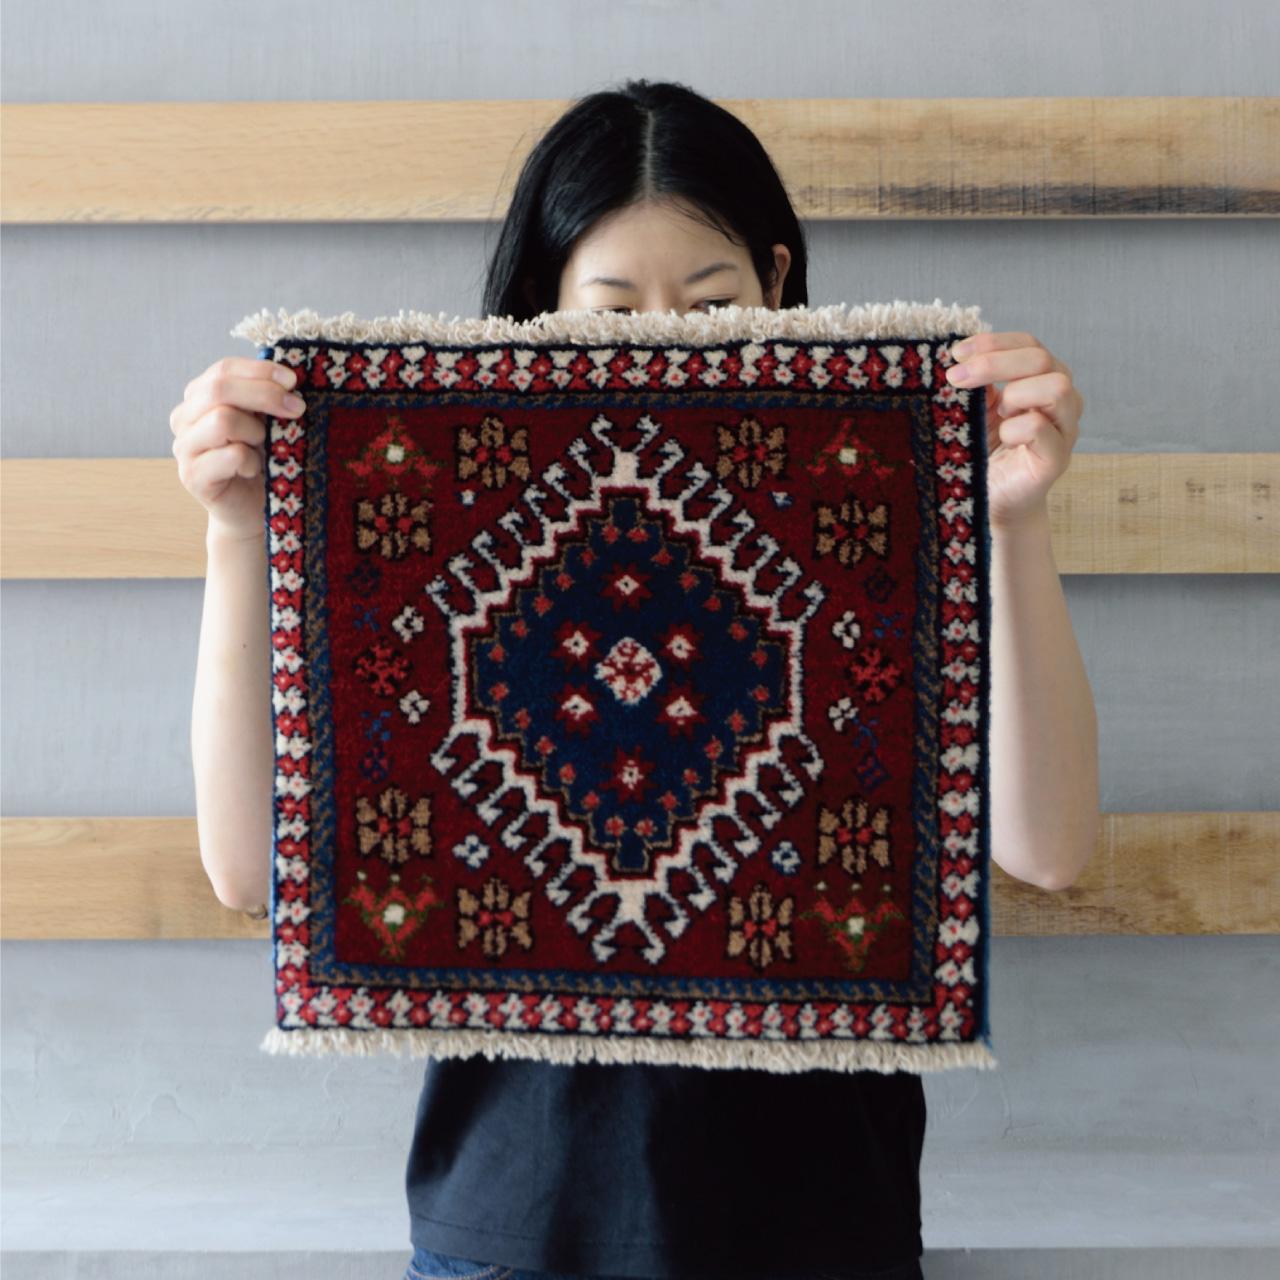 Tribal rug #71326 / 40×40cm / ヤラメ族 / ¥16,000-(税別)